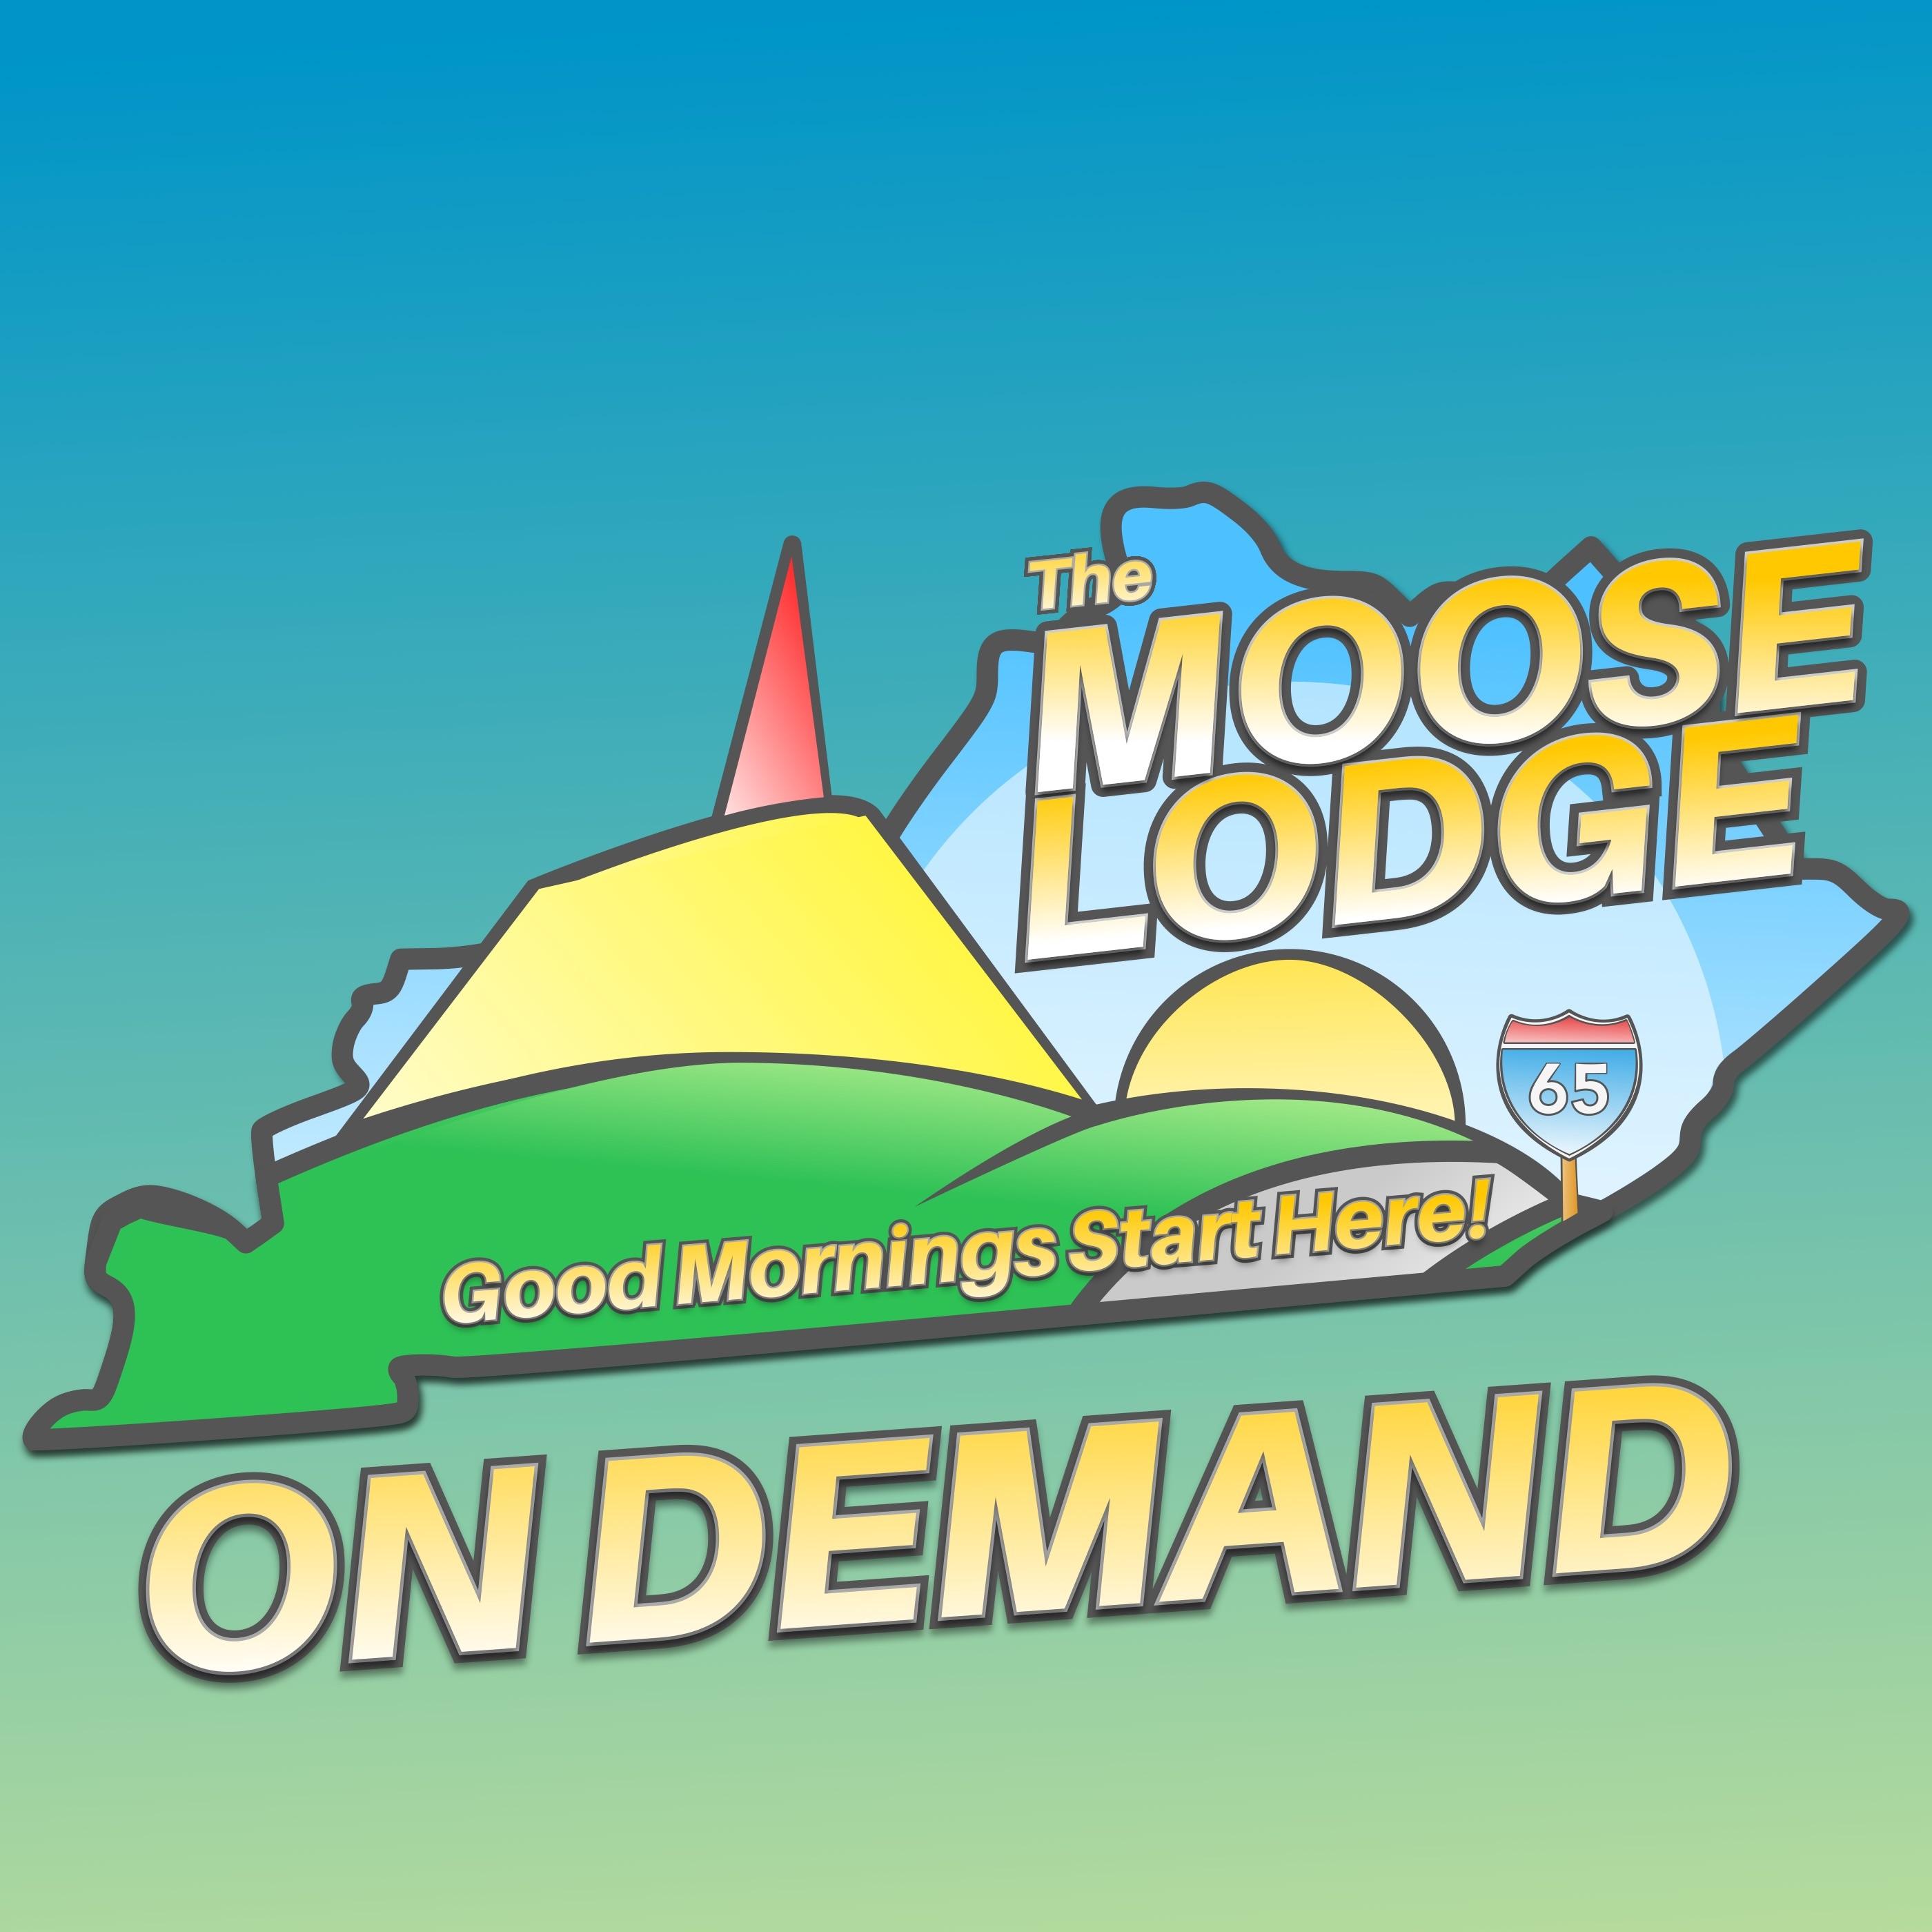 The Moose Lodge